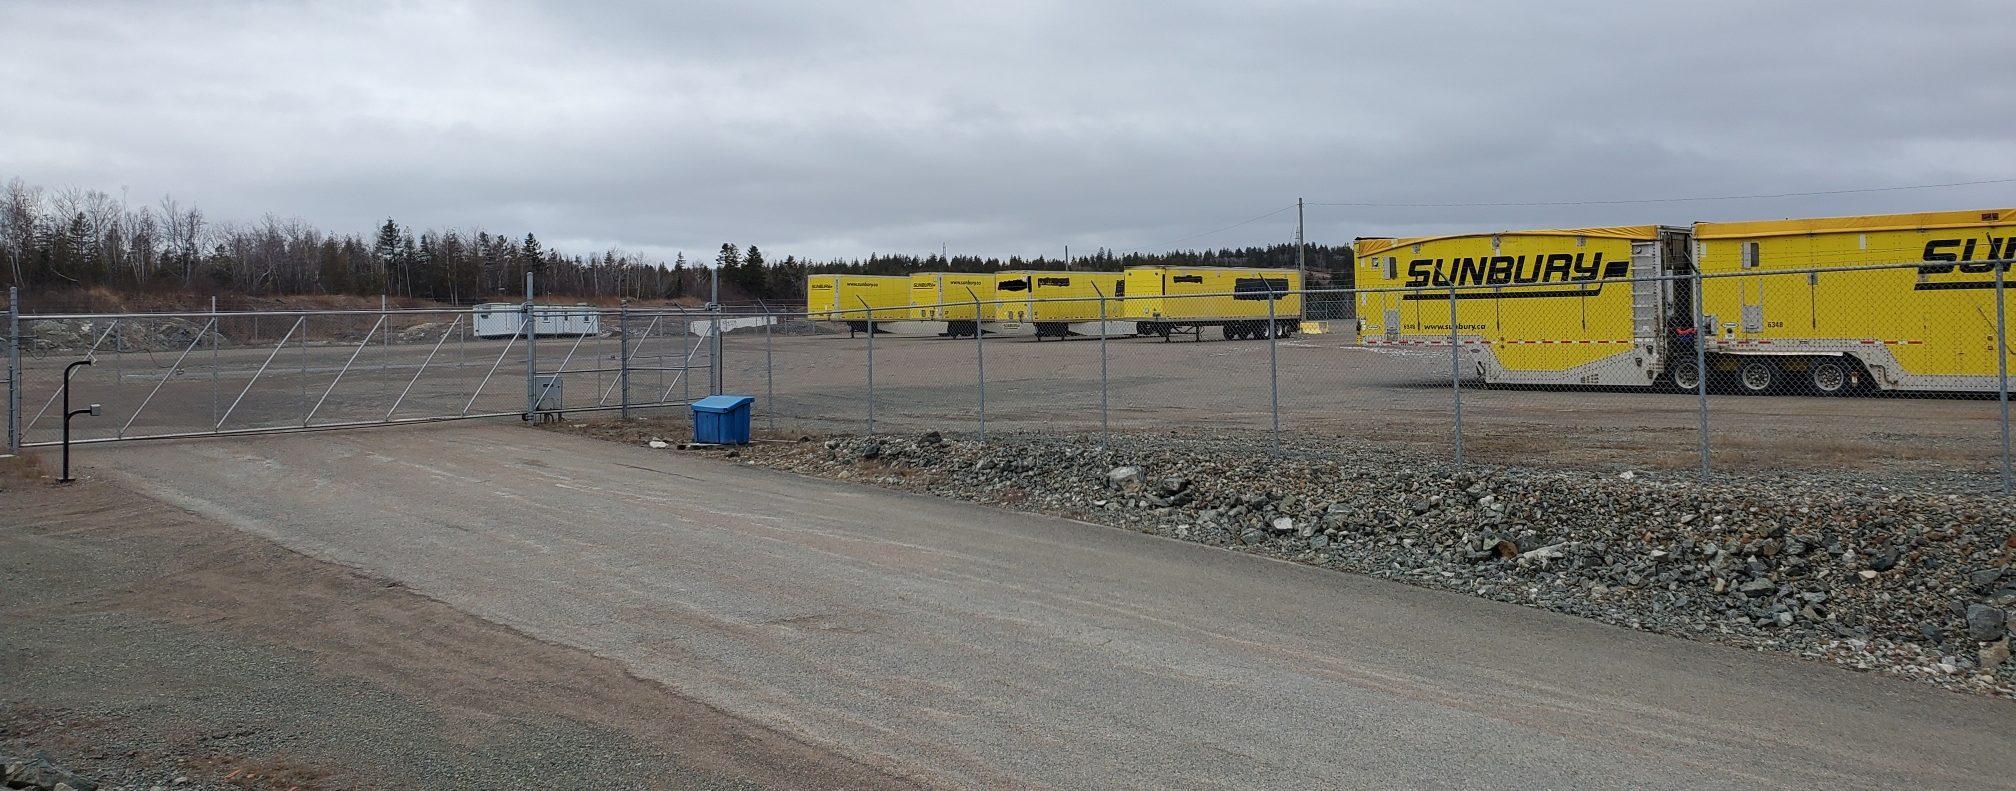 570 King William Road, Saint John, NB